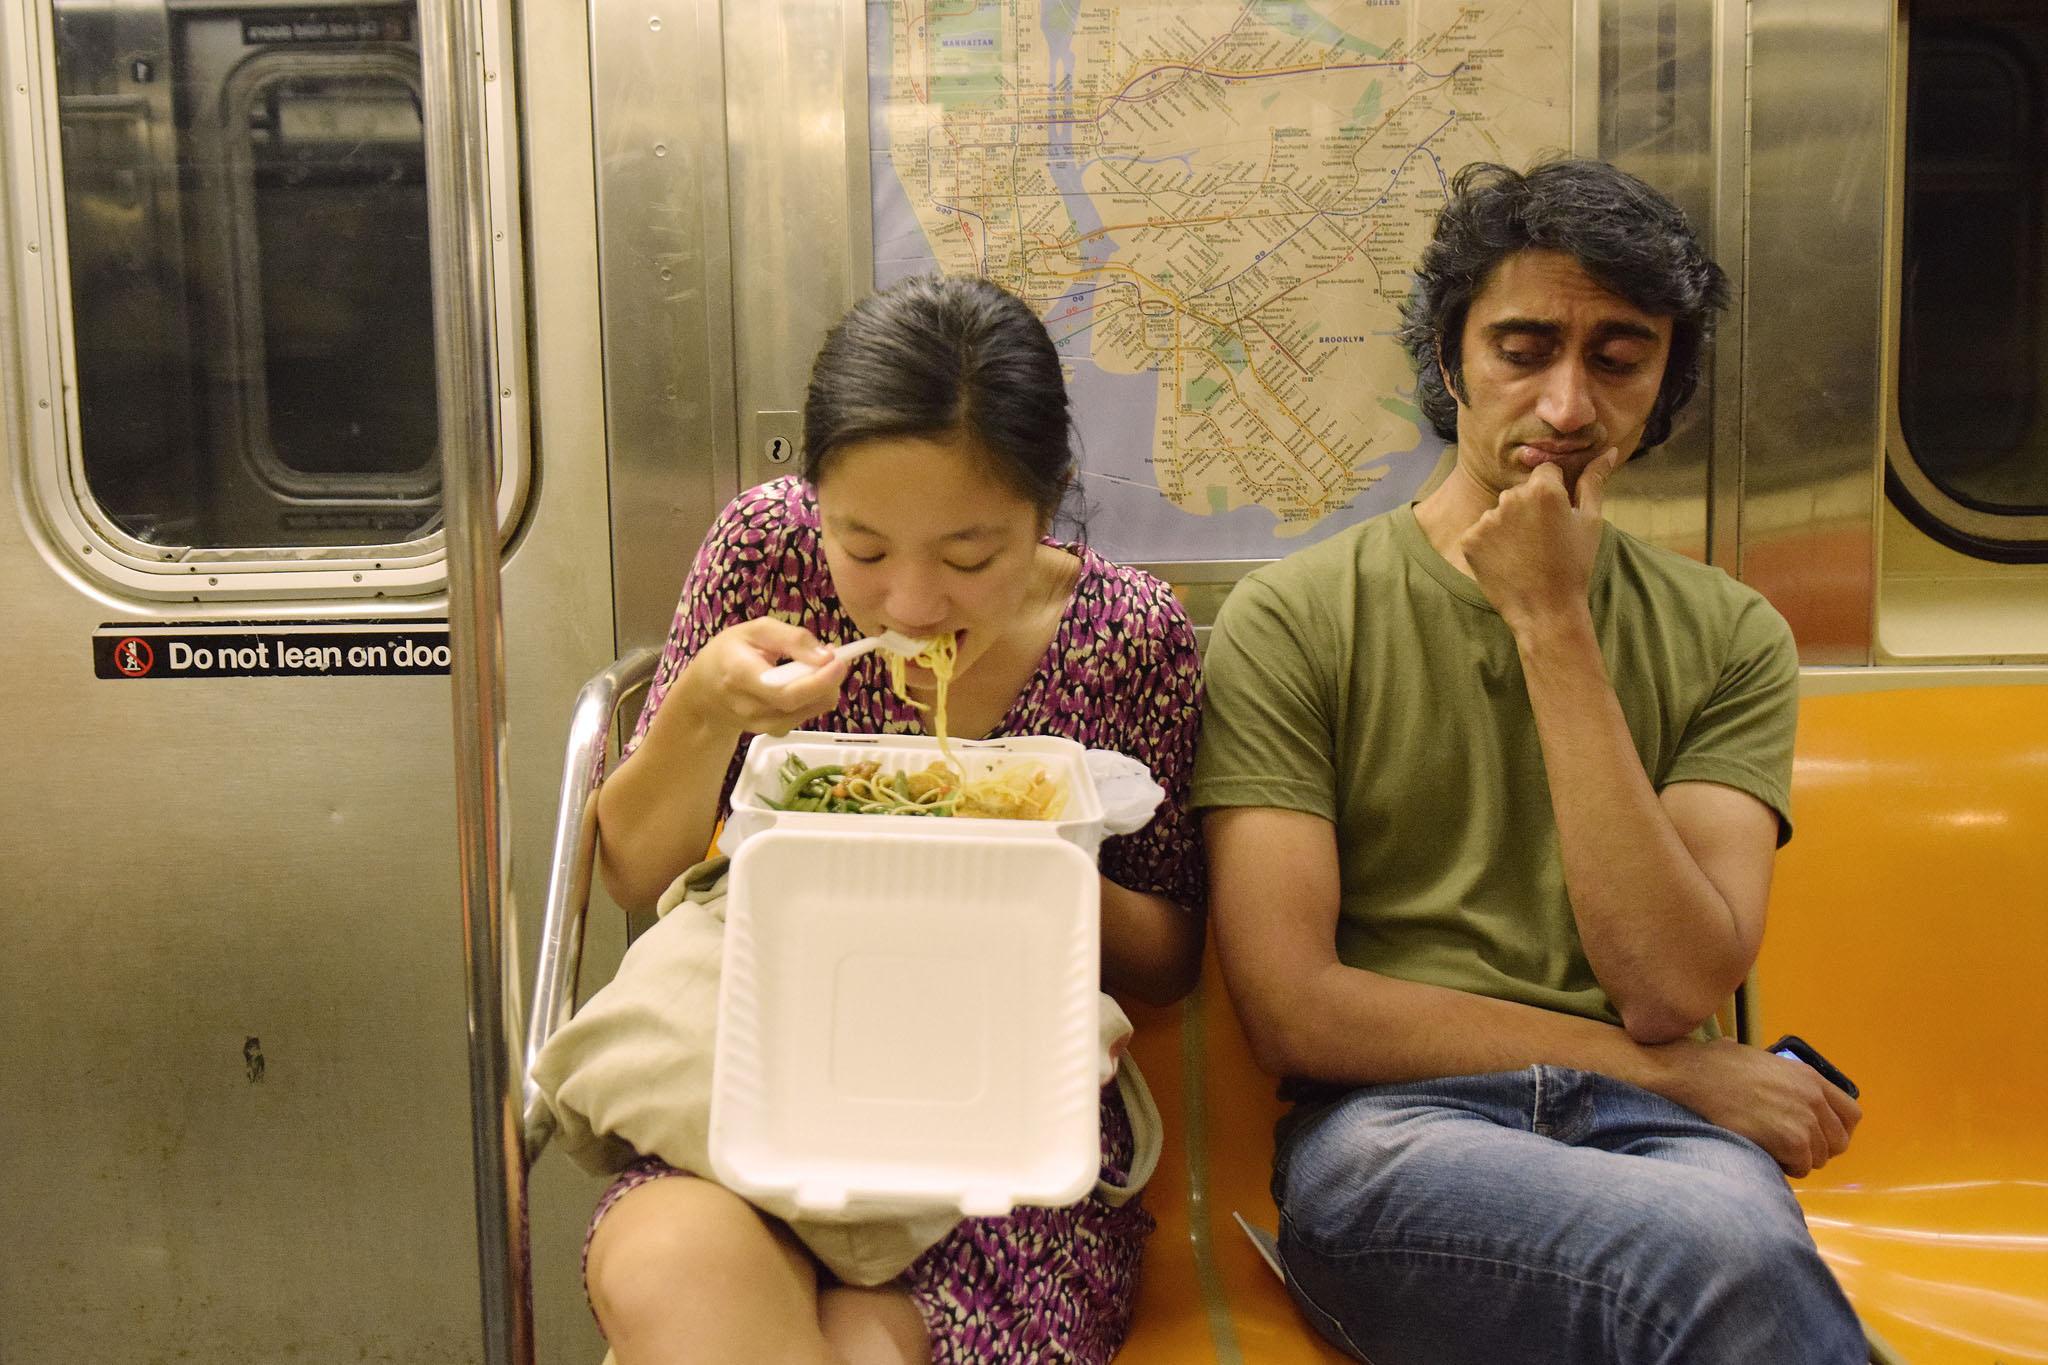 Eating takeout on the subway. (Photo: Richard Yeh / WNYC)